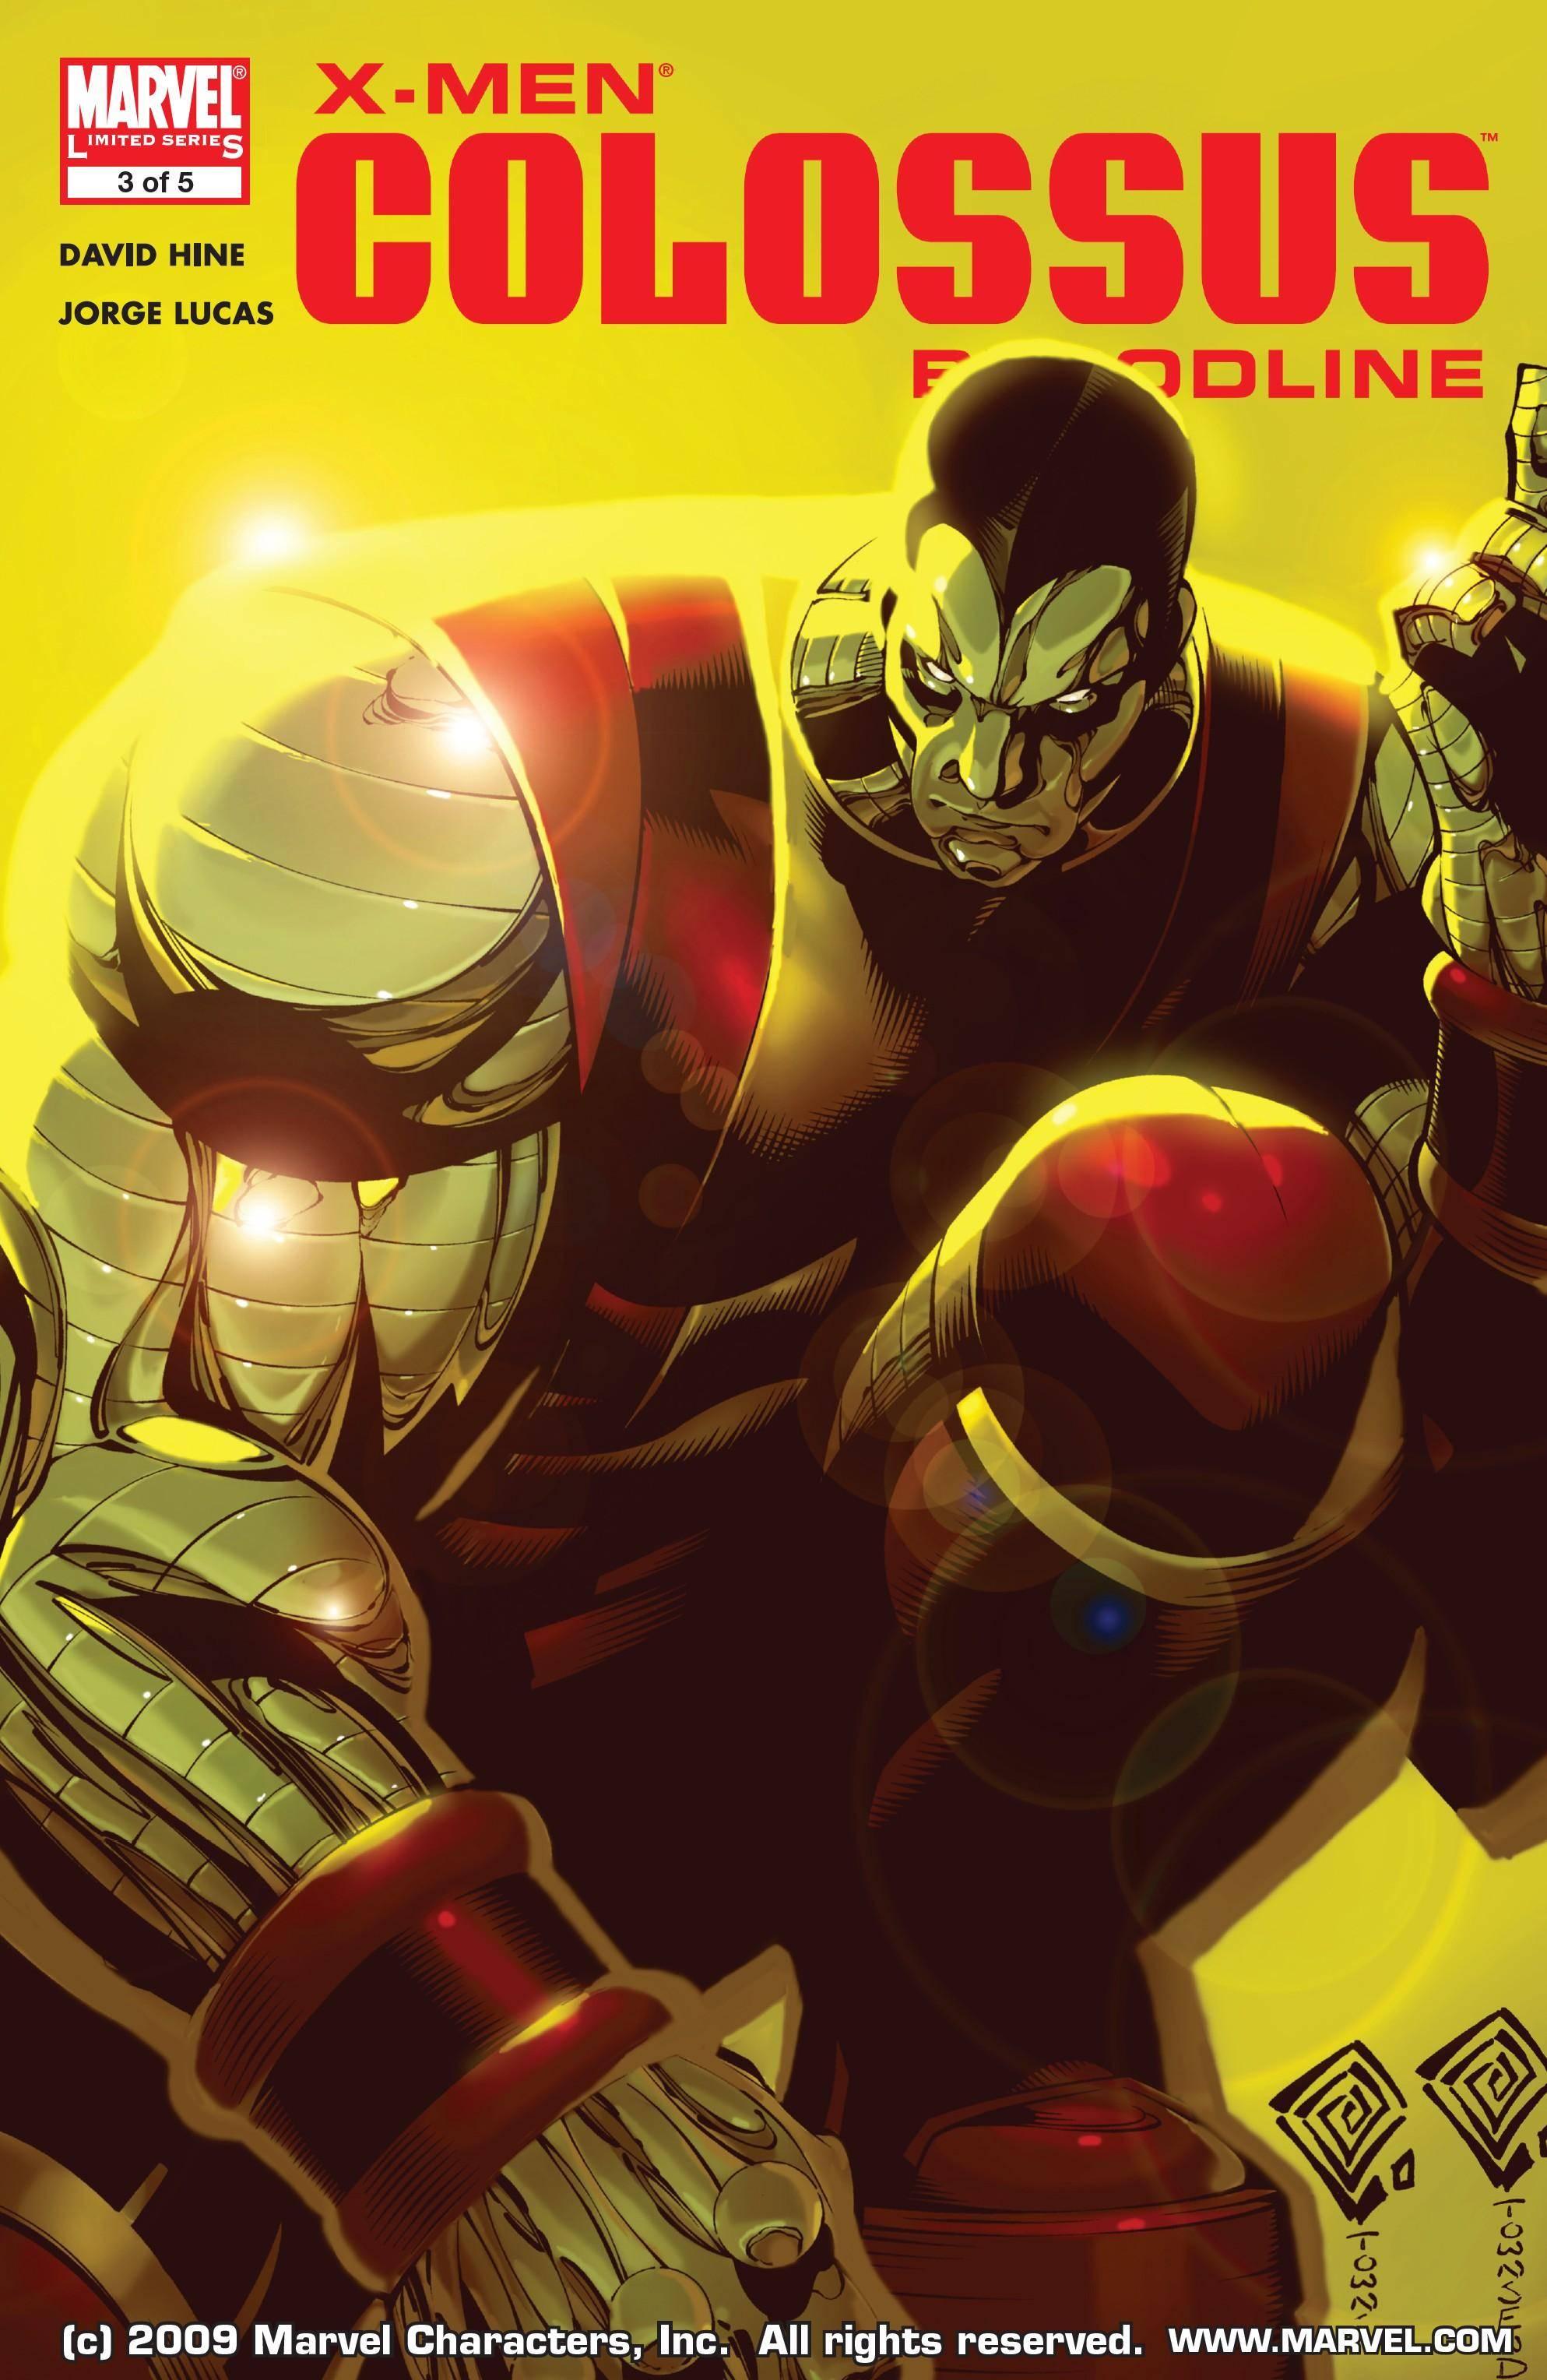 X-Men-Colossus.Bloodline.03.of.05.2006.Digital-Empire